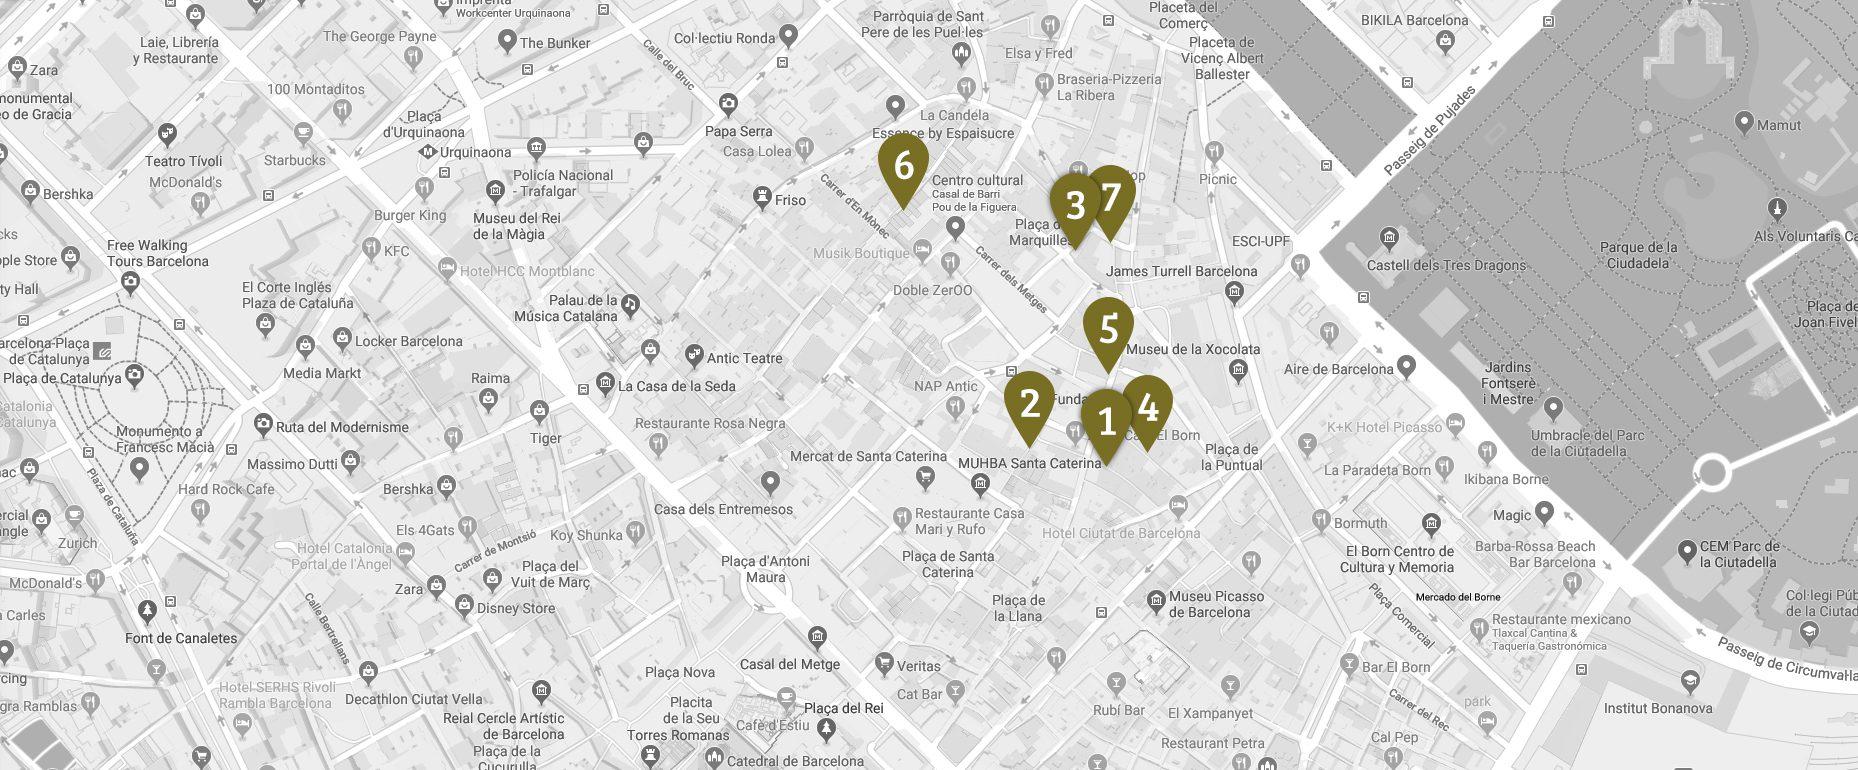 Mapa-contacto_150dpi